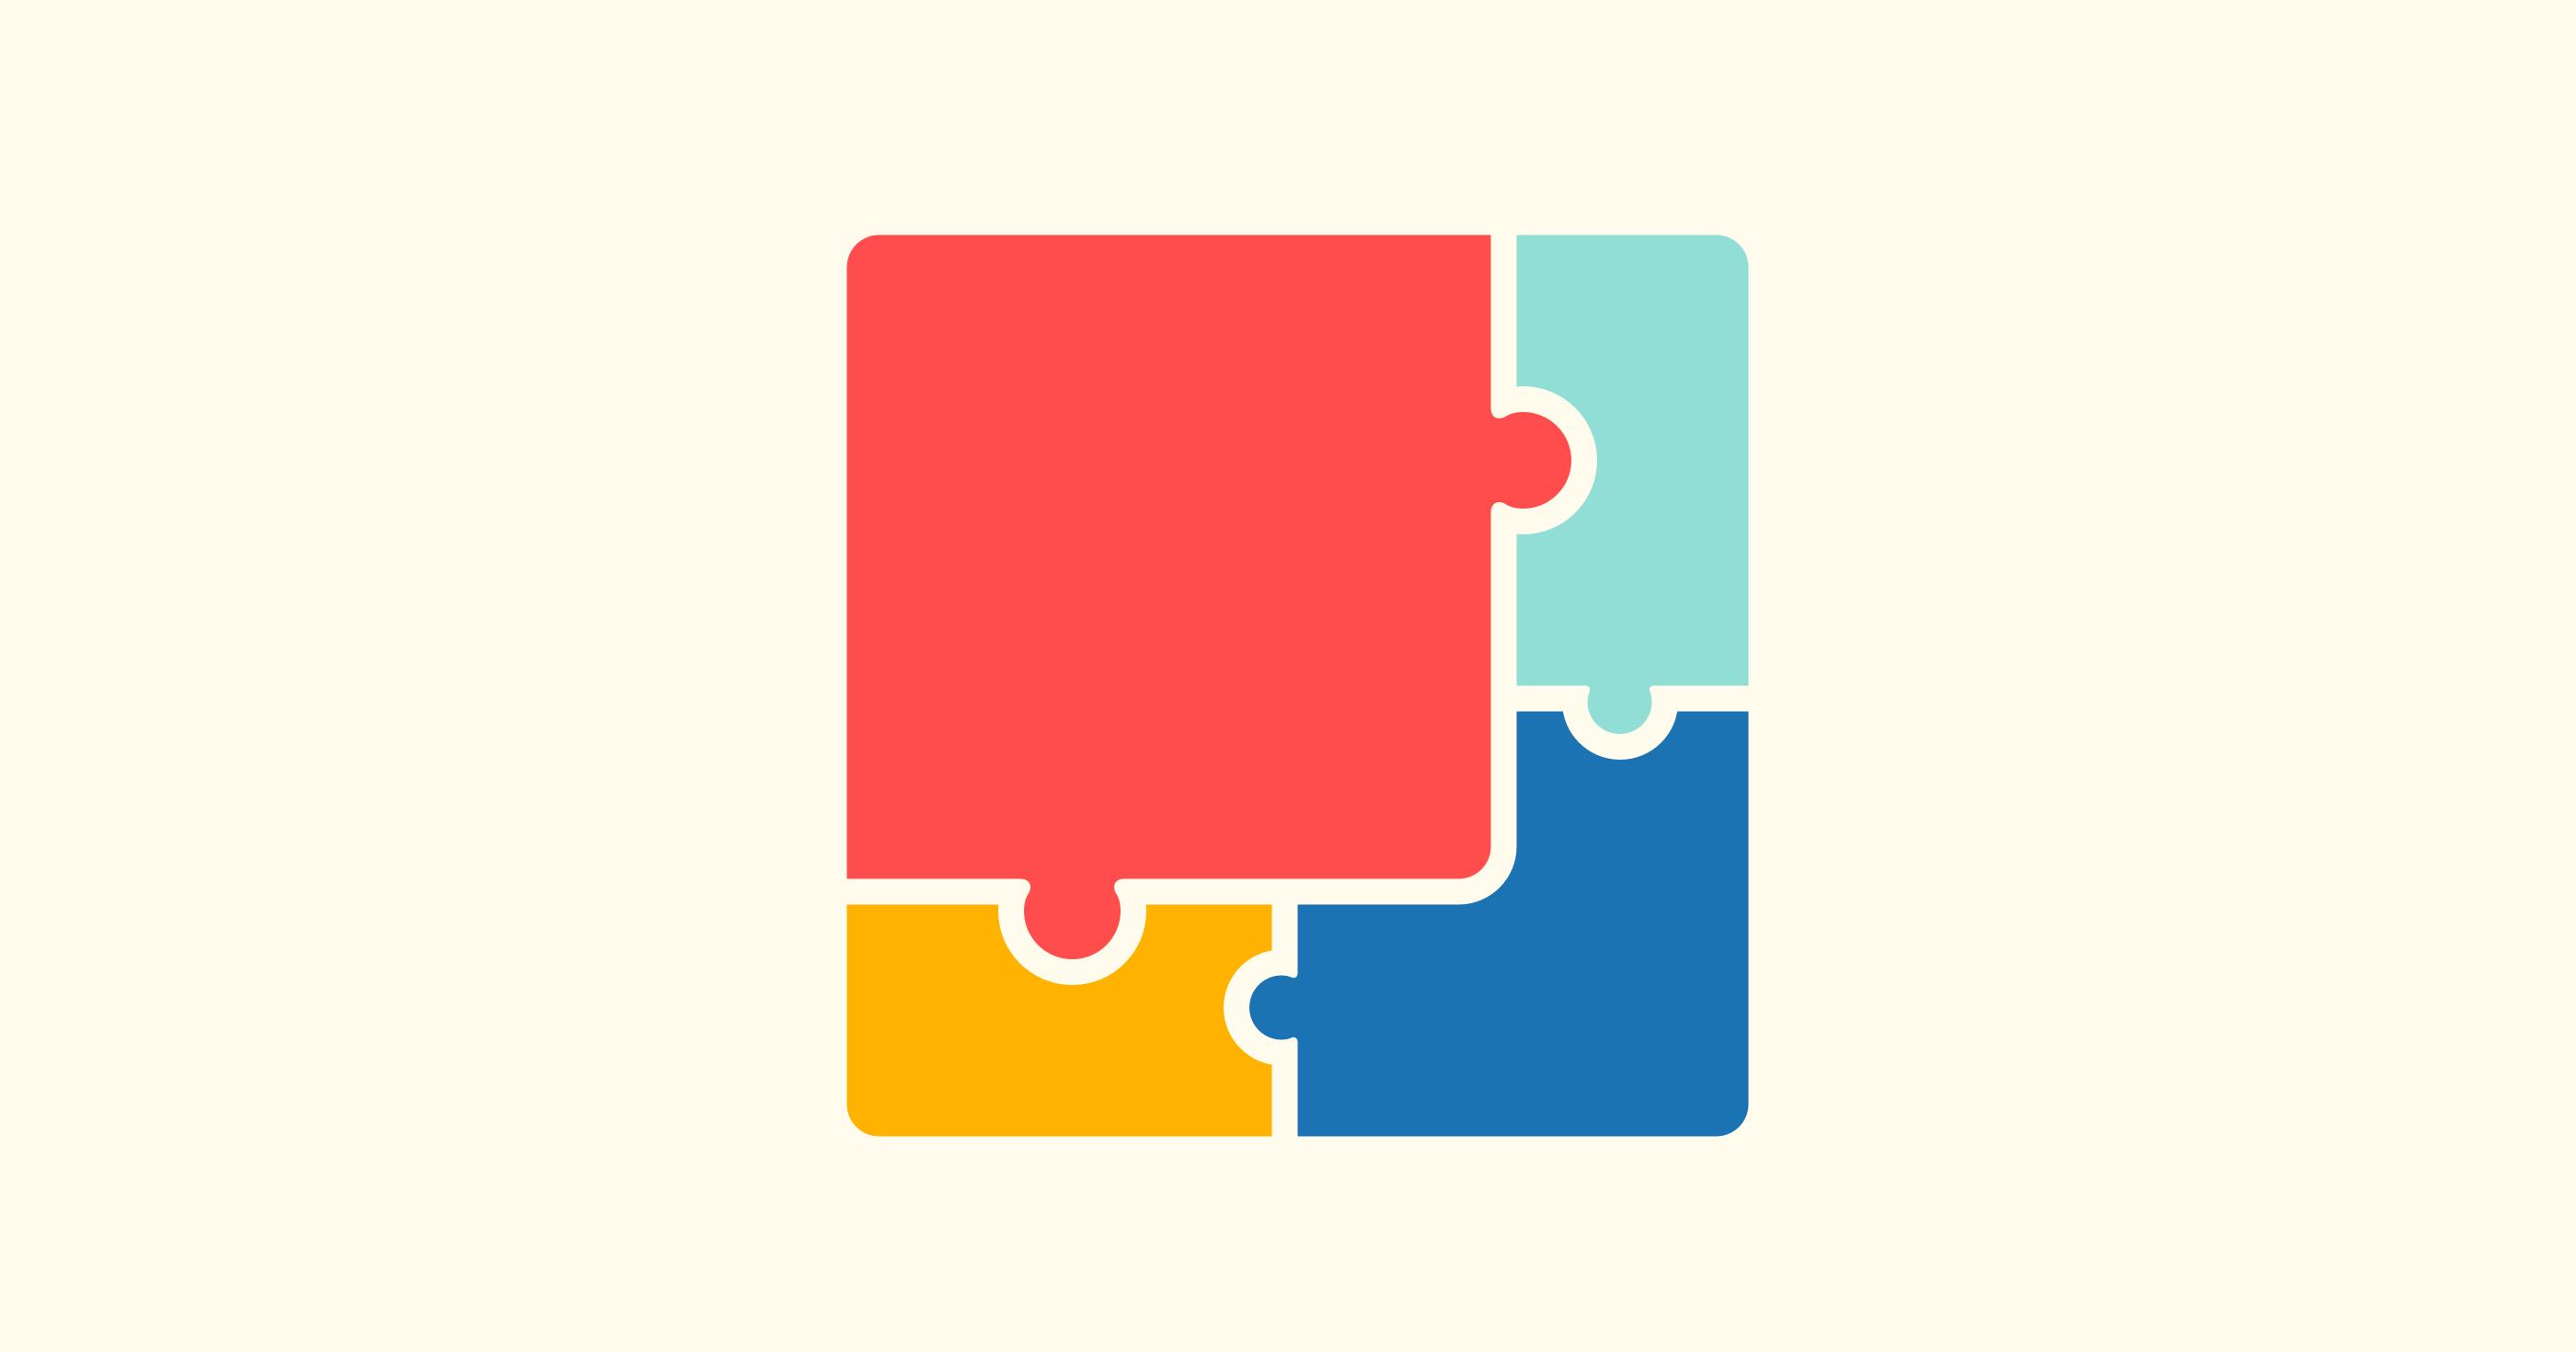 elements-vs-graphic-styles